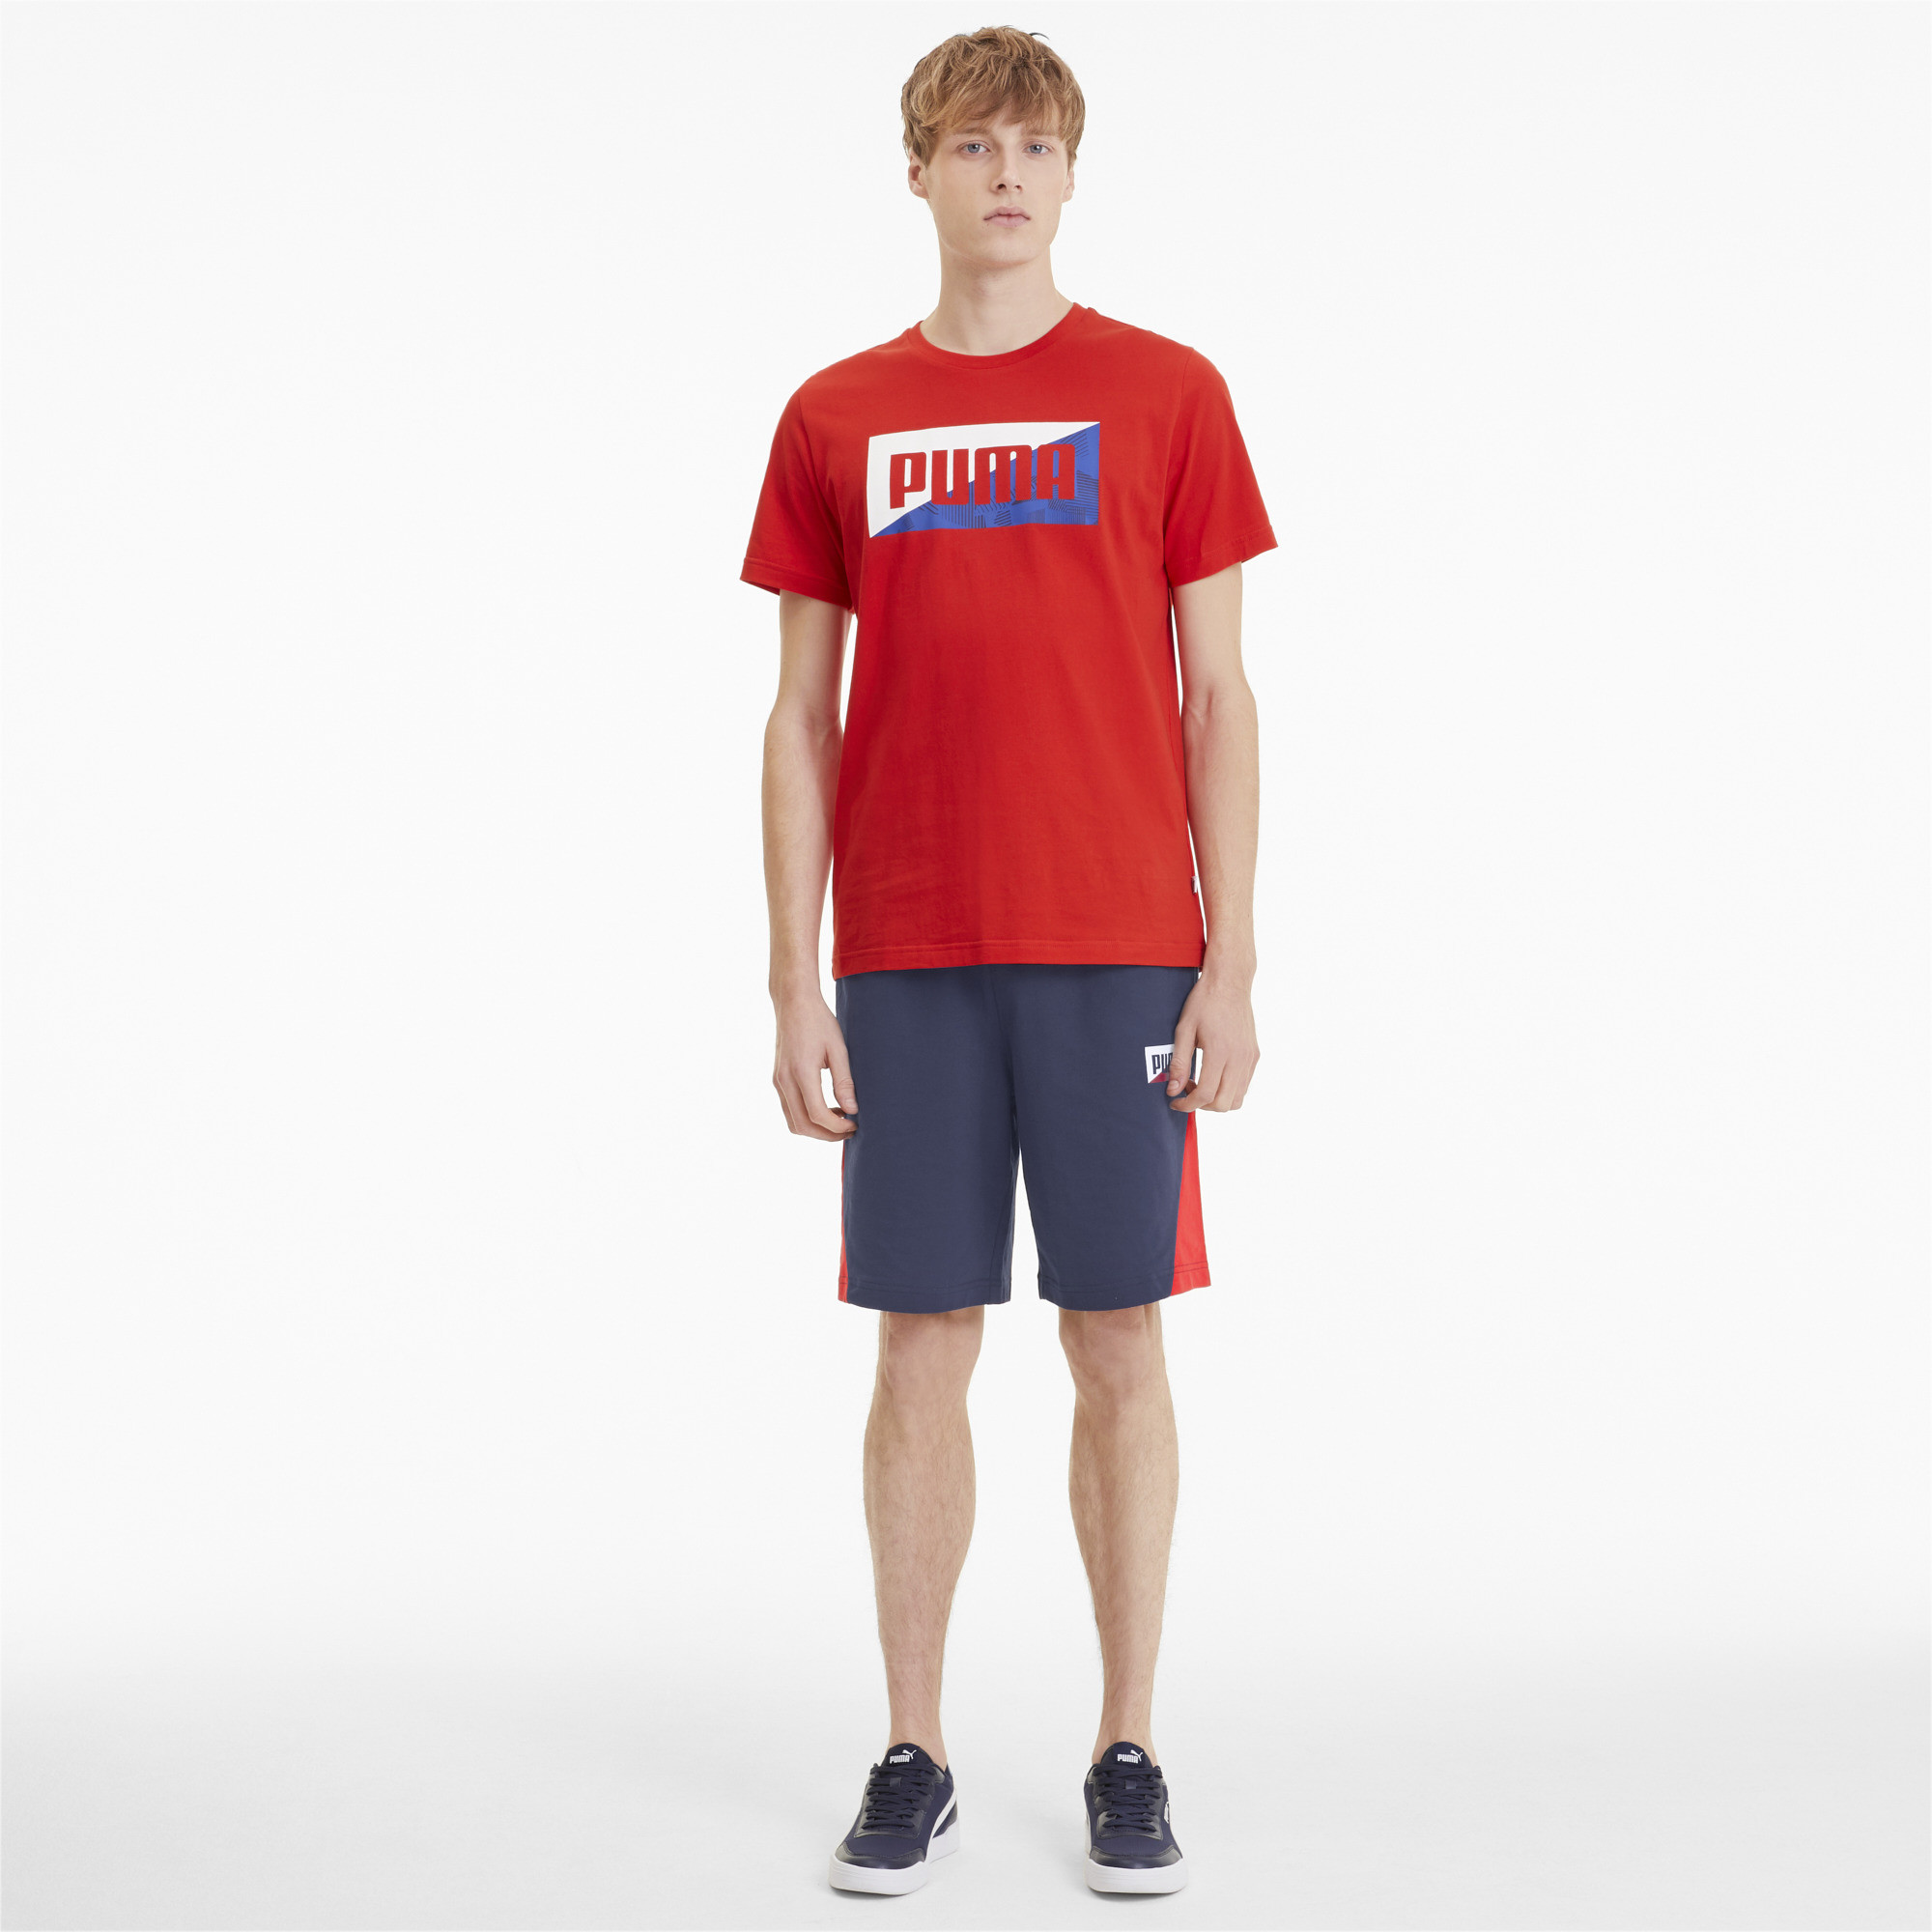 PUMA-Summer-Print-Men-039-s-Shorts-Men-Knitted-Shorts-Basics thumbnail 6